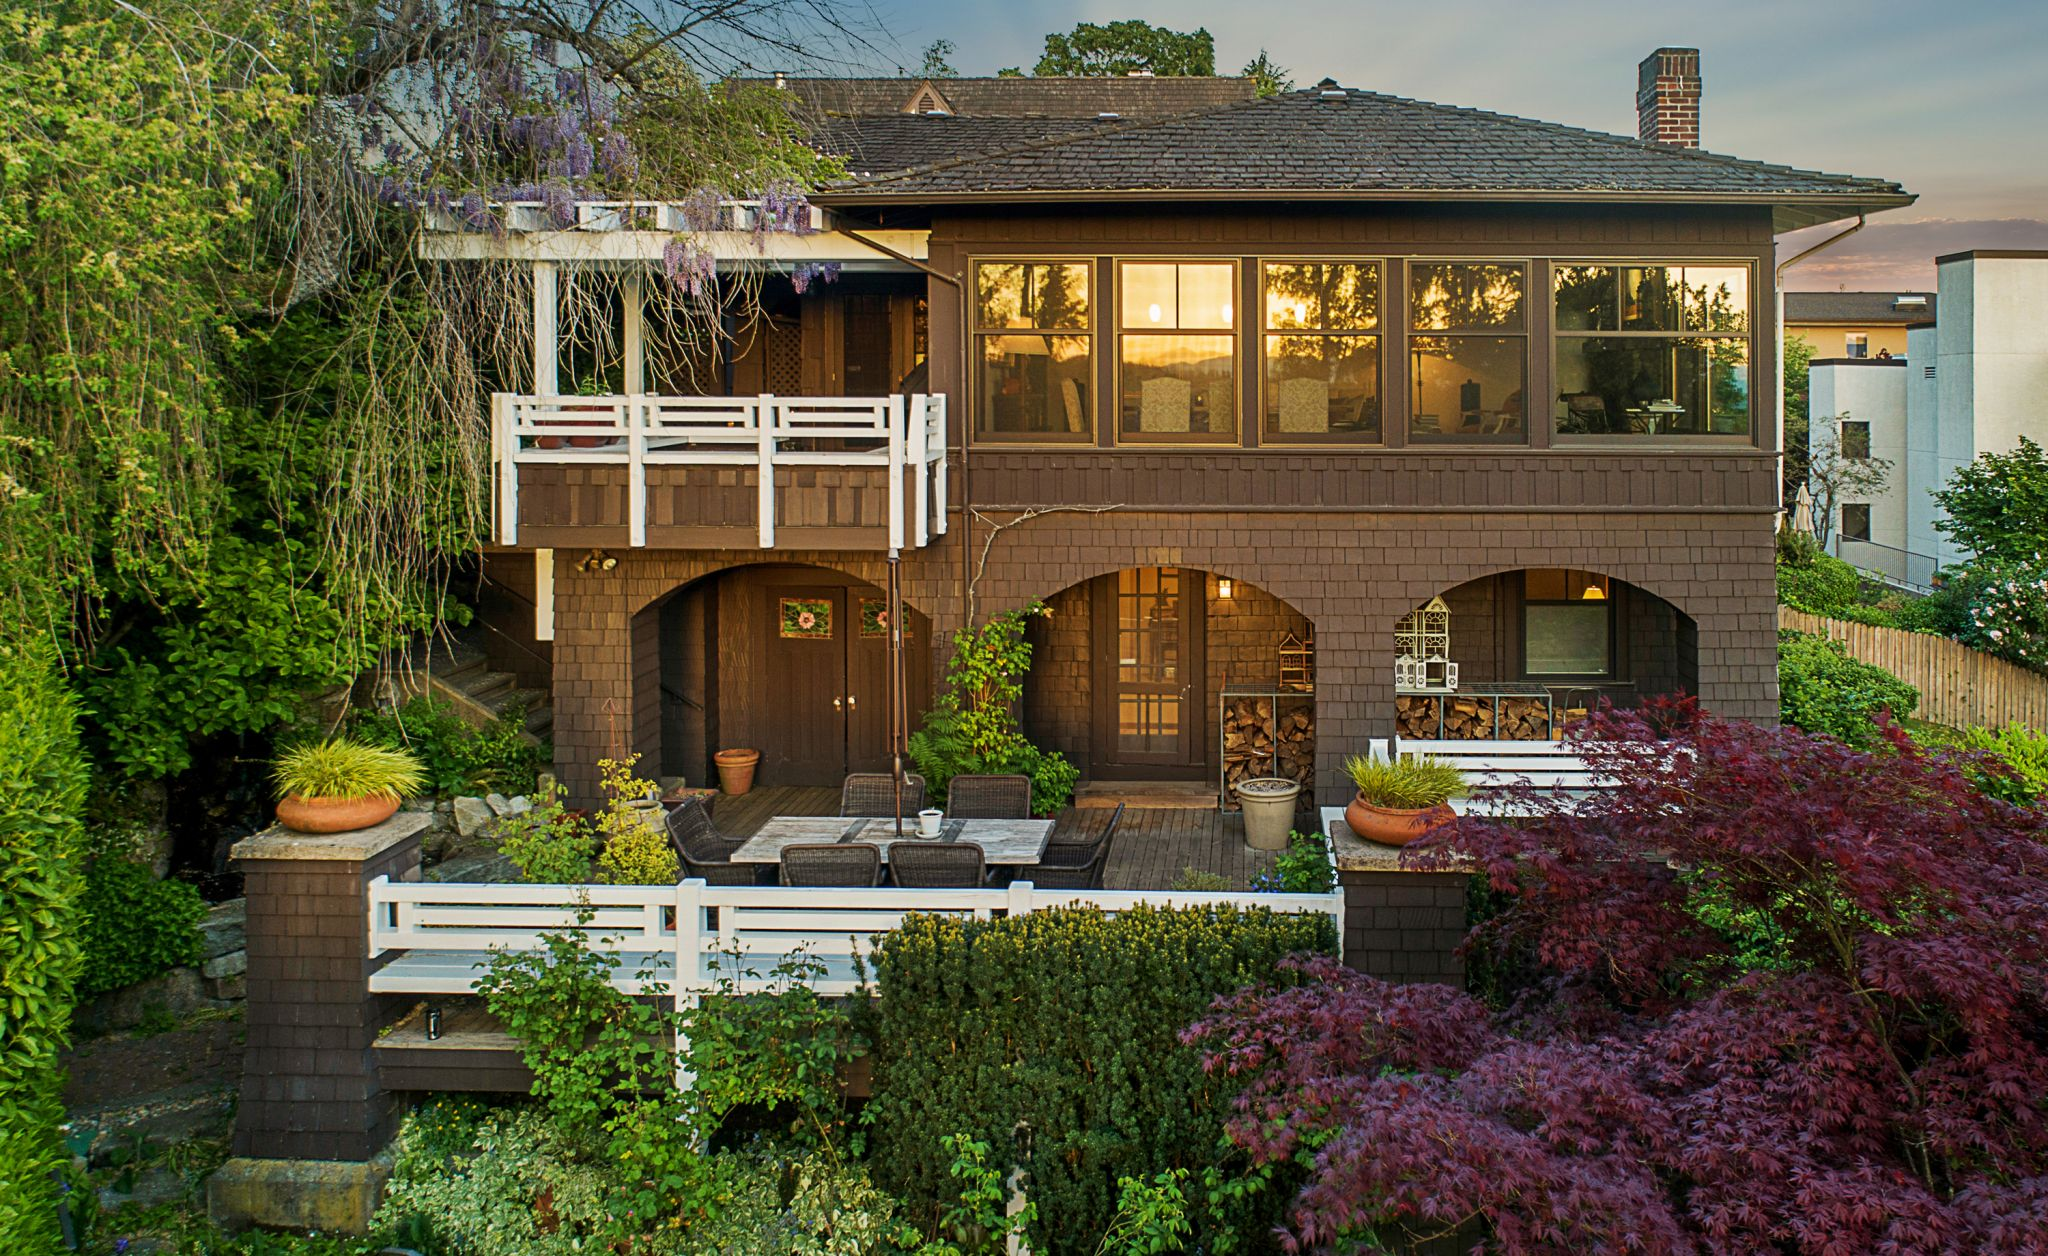 Historic 1900s Bowen Bungalow yours for $2.42M